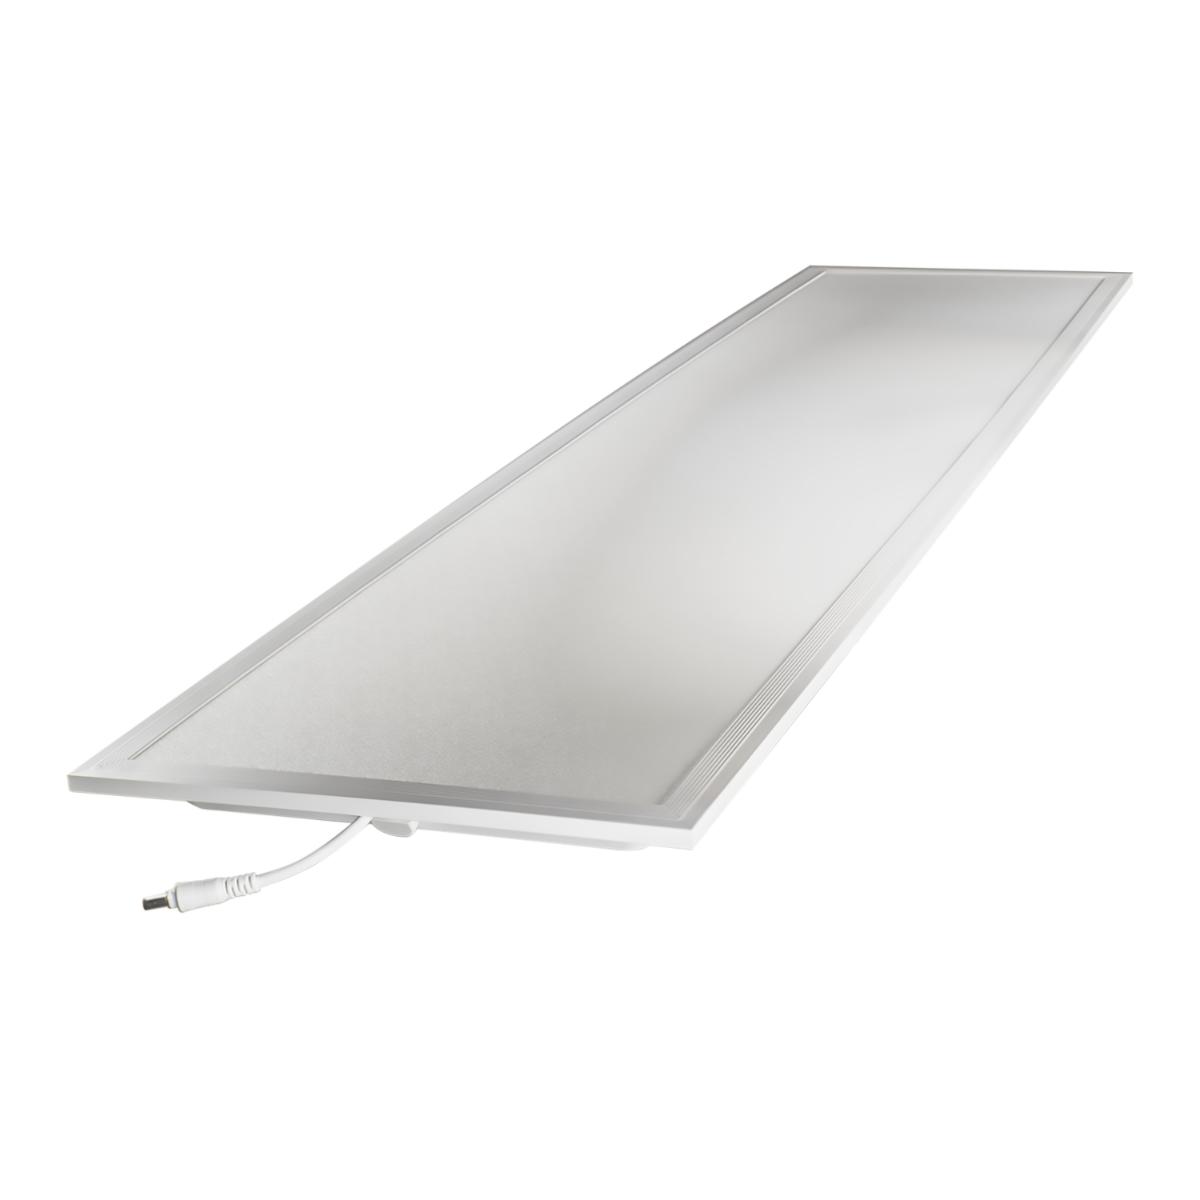 Noxion LED Paneel Delta Pro V2.0 Xitanium DALI 30W 30x120cm 6500K 4110lm UGR <19   Dali Dimbaar - Vervanger voor 2x36W